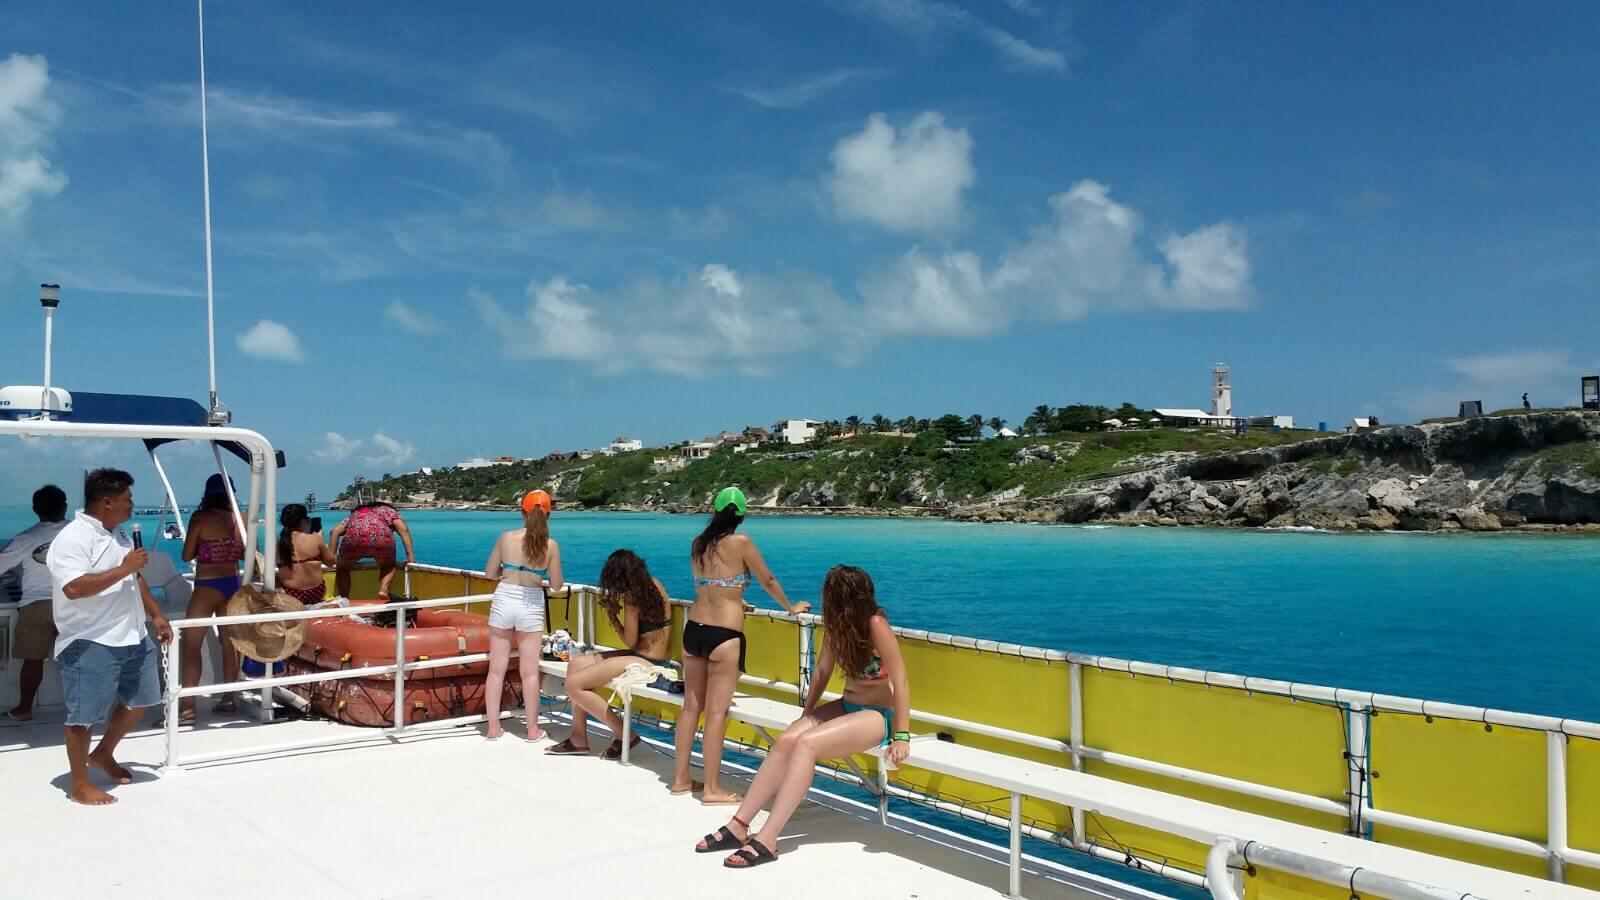 Cancun-Isla-Mujeres-Tours-Snorkel-Beach-All-Inclusive-8